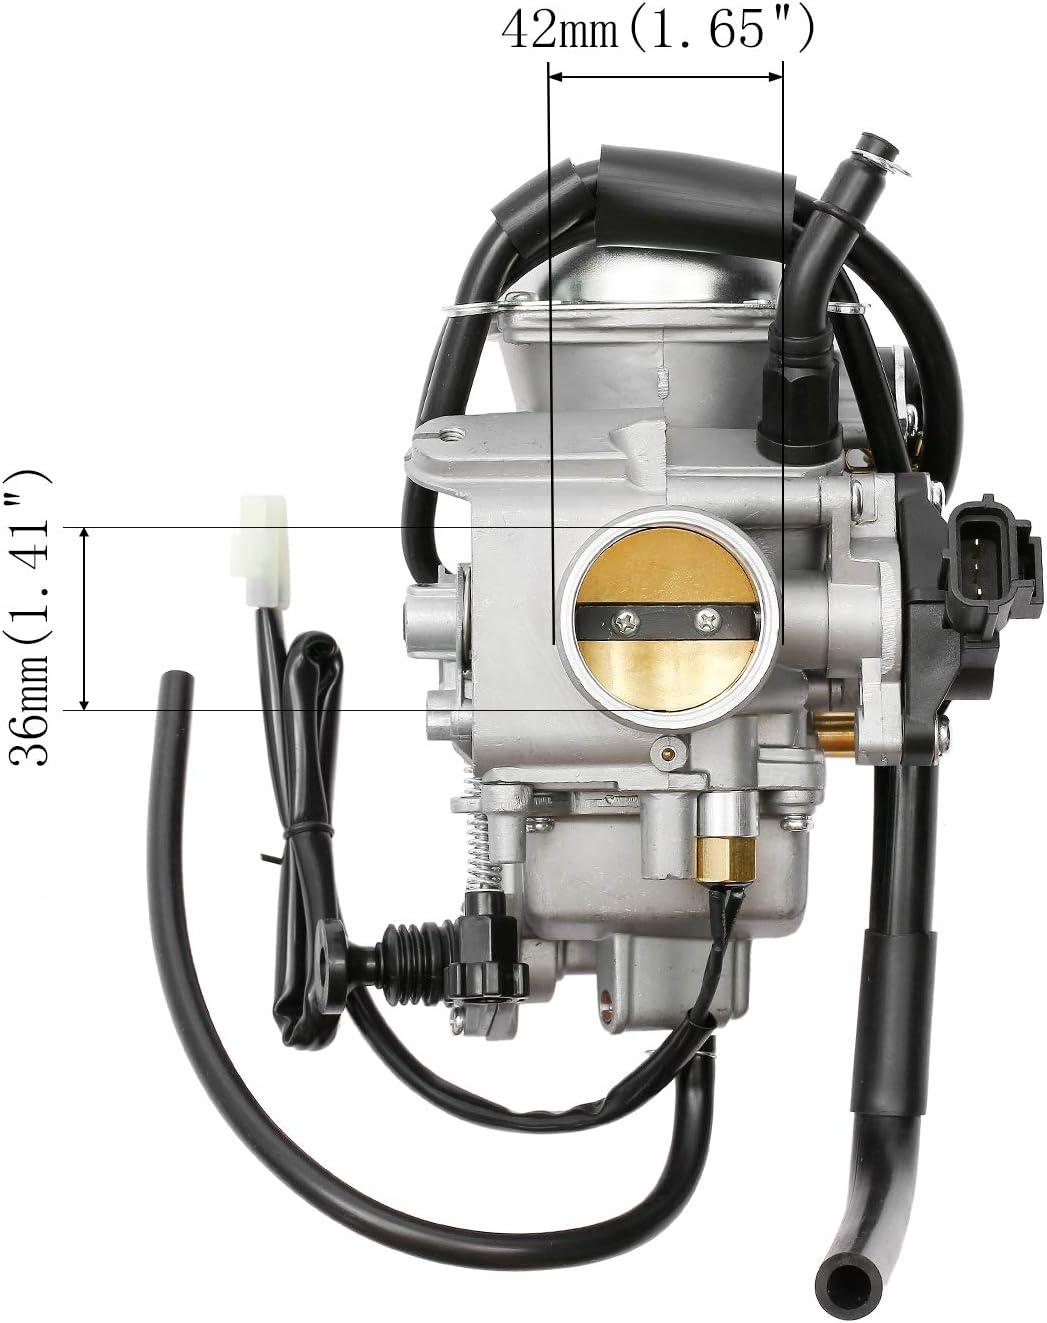 2005-2011 Honda Fourtrax Foreman 500 TRX500FE TRX500FM TRX500FPE TRX500FPM TRX500TM Carburetor for 2001-2005 Honda Foreman Rubicon 500 TRX500